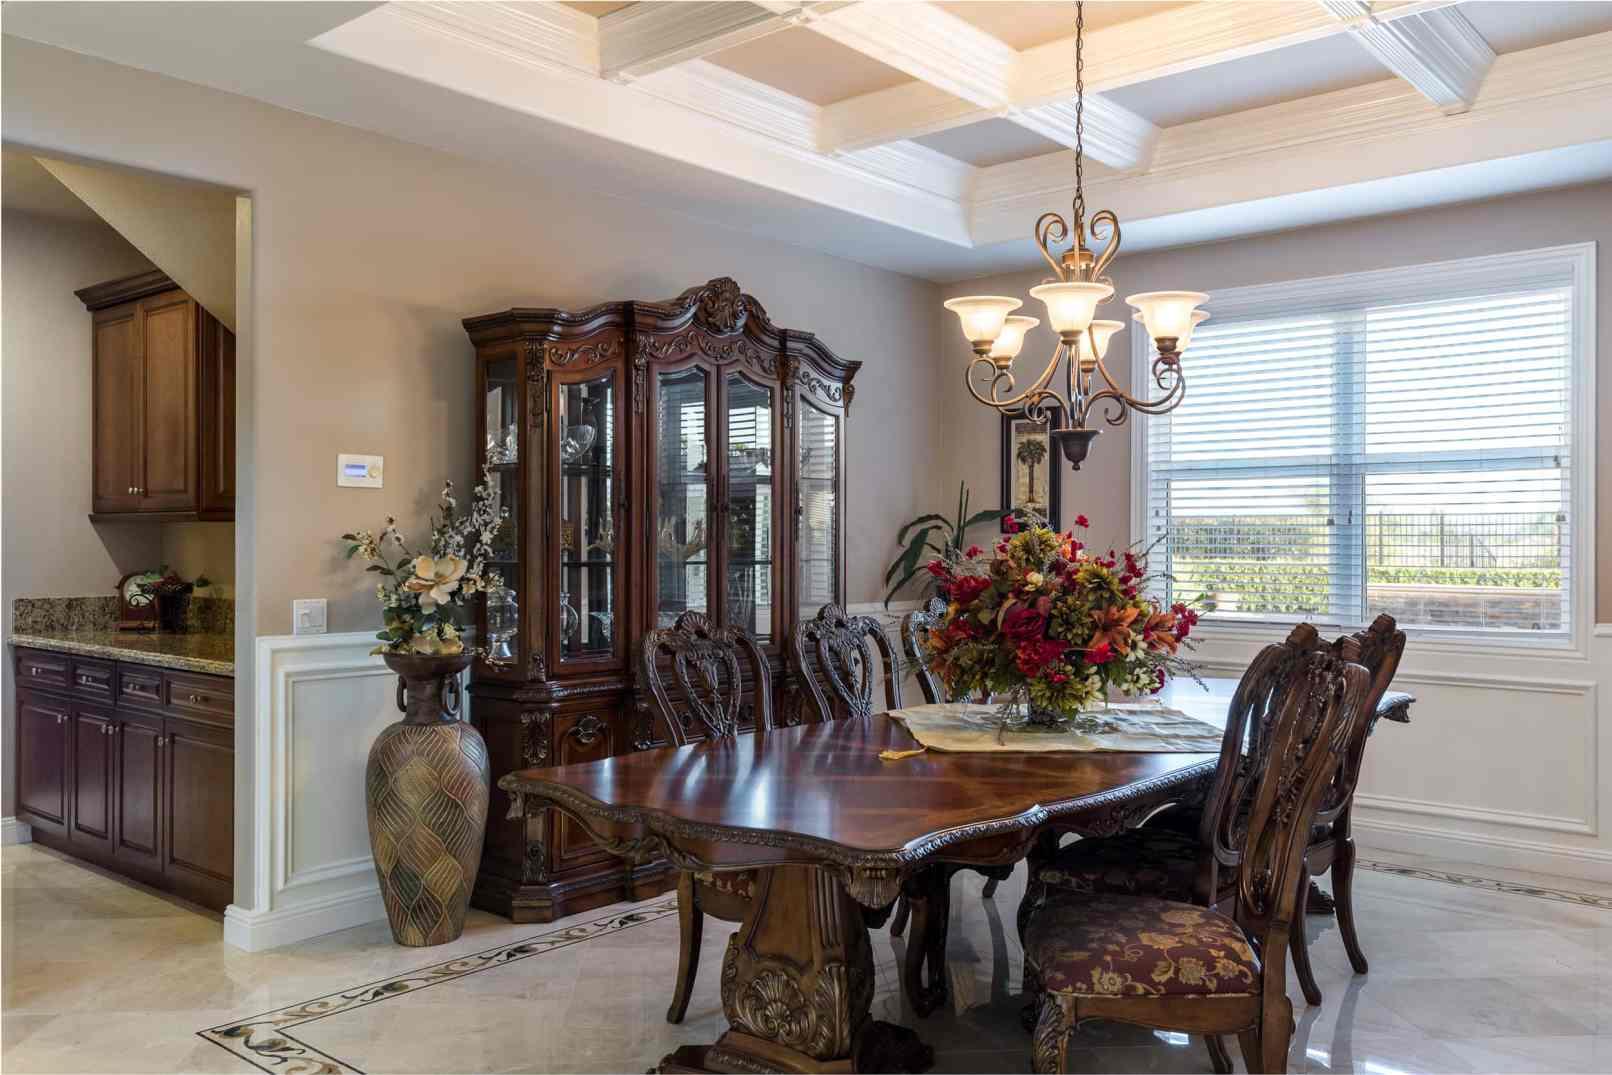 https://i1.wp.com/ericnortonphotography.com/wp-content/uploads/2016/08/Yorba-Linda-Orange-County-Real-Estate-Photography-Dining-Room.jpg?fit=1612%2C1075&ssl=1